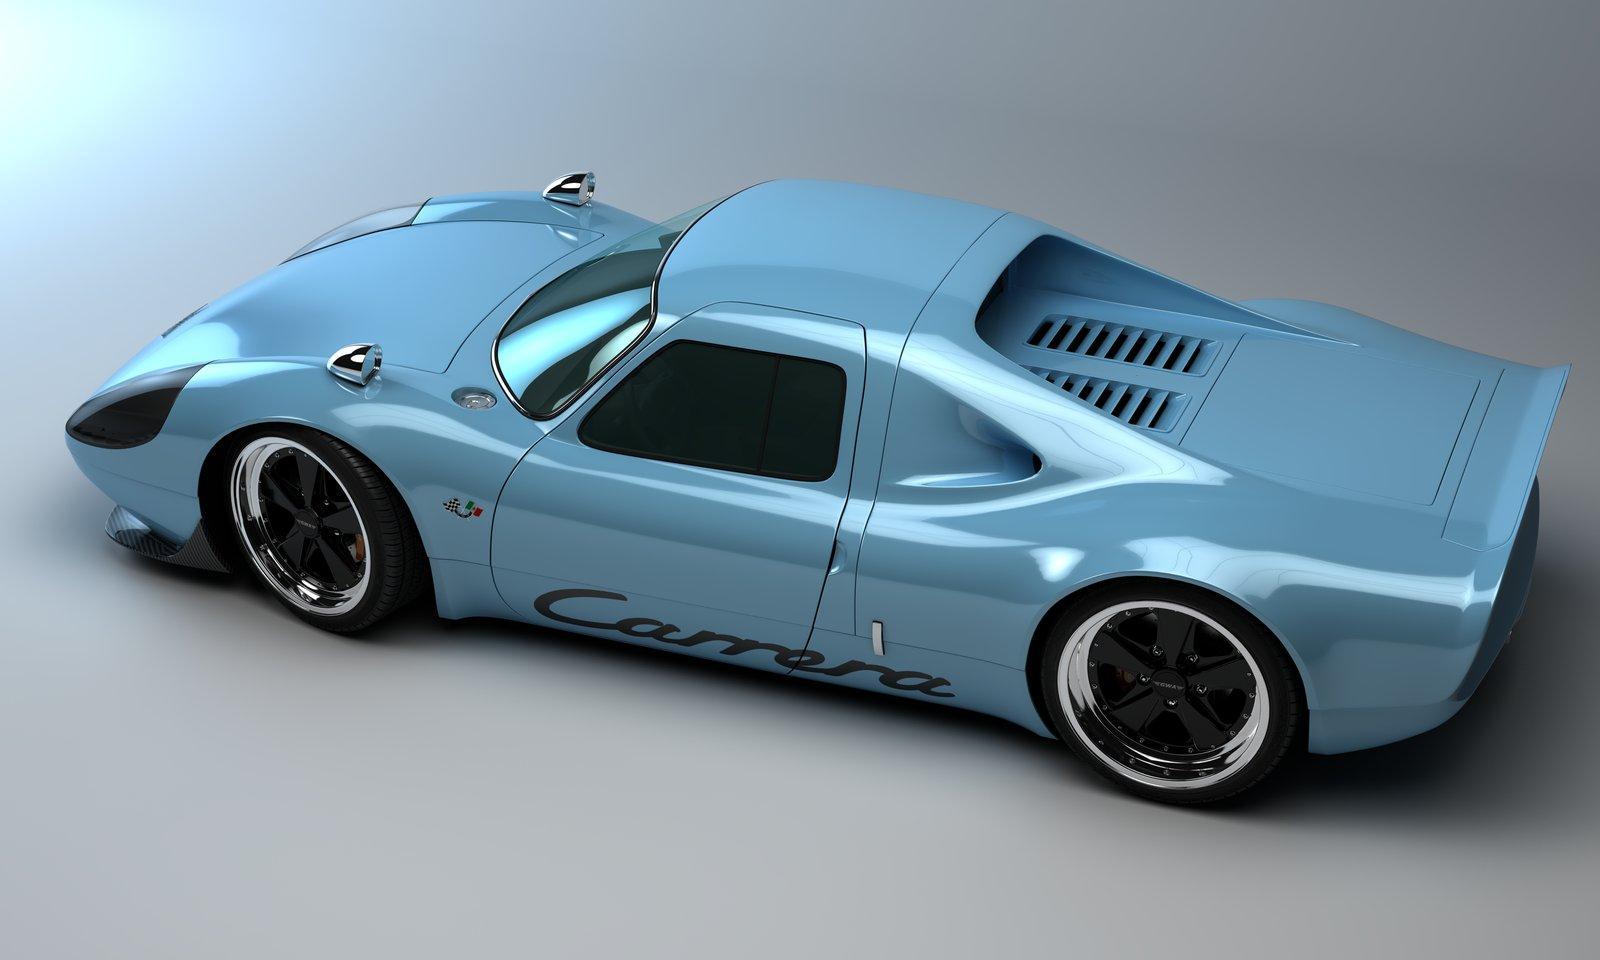 Porsche 904 Carrera Gts Porsche Everyday Dedeporsches Blog